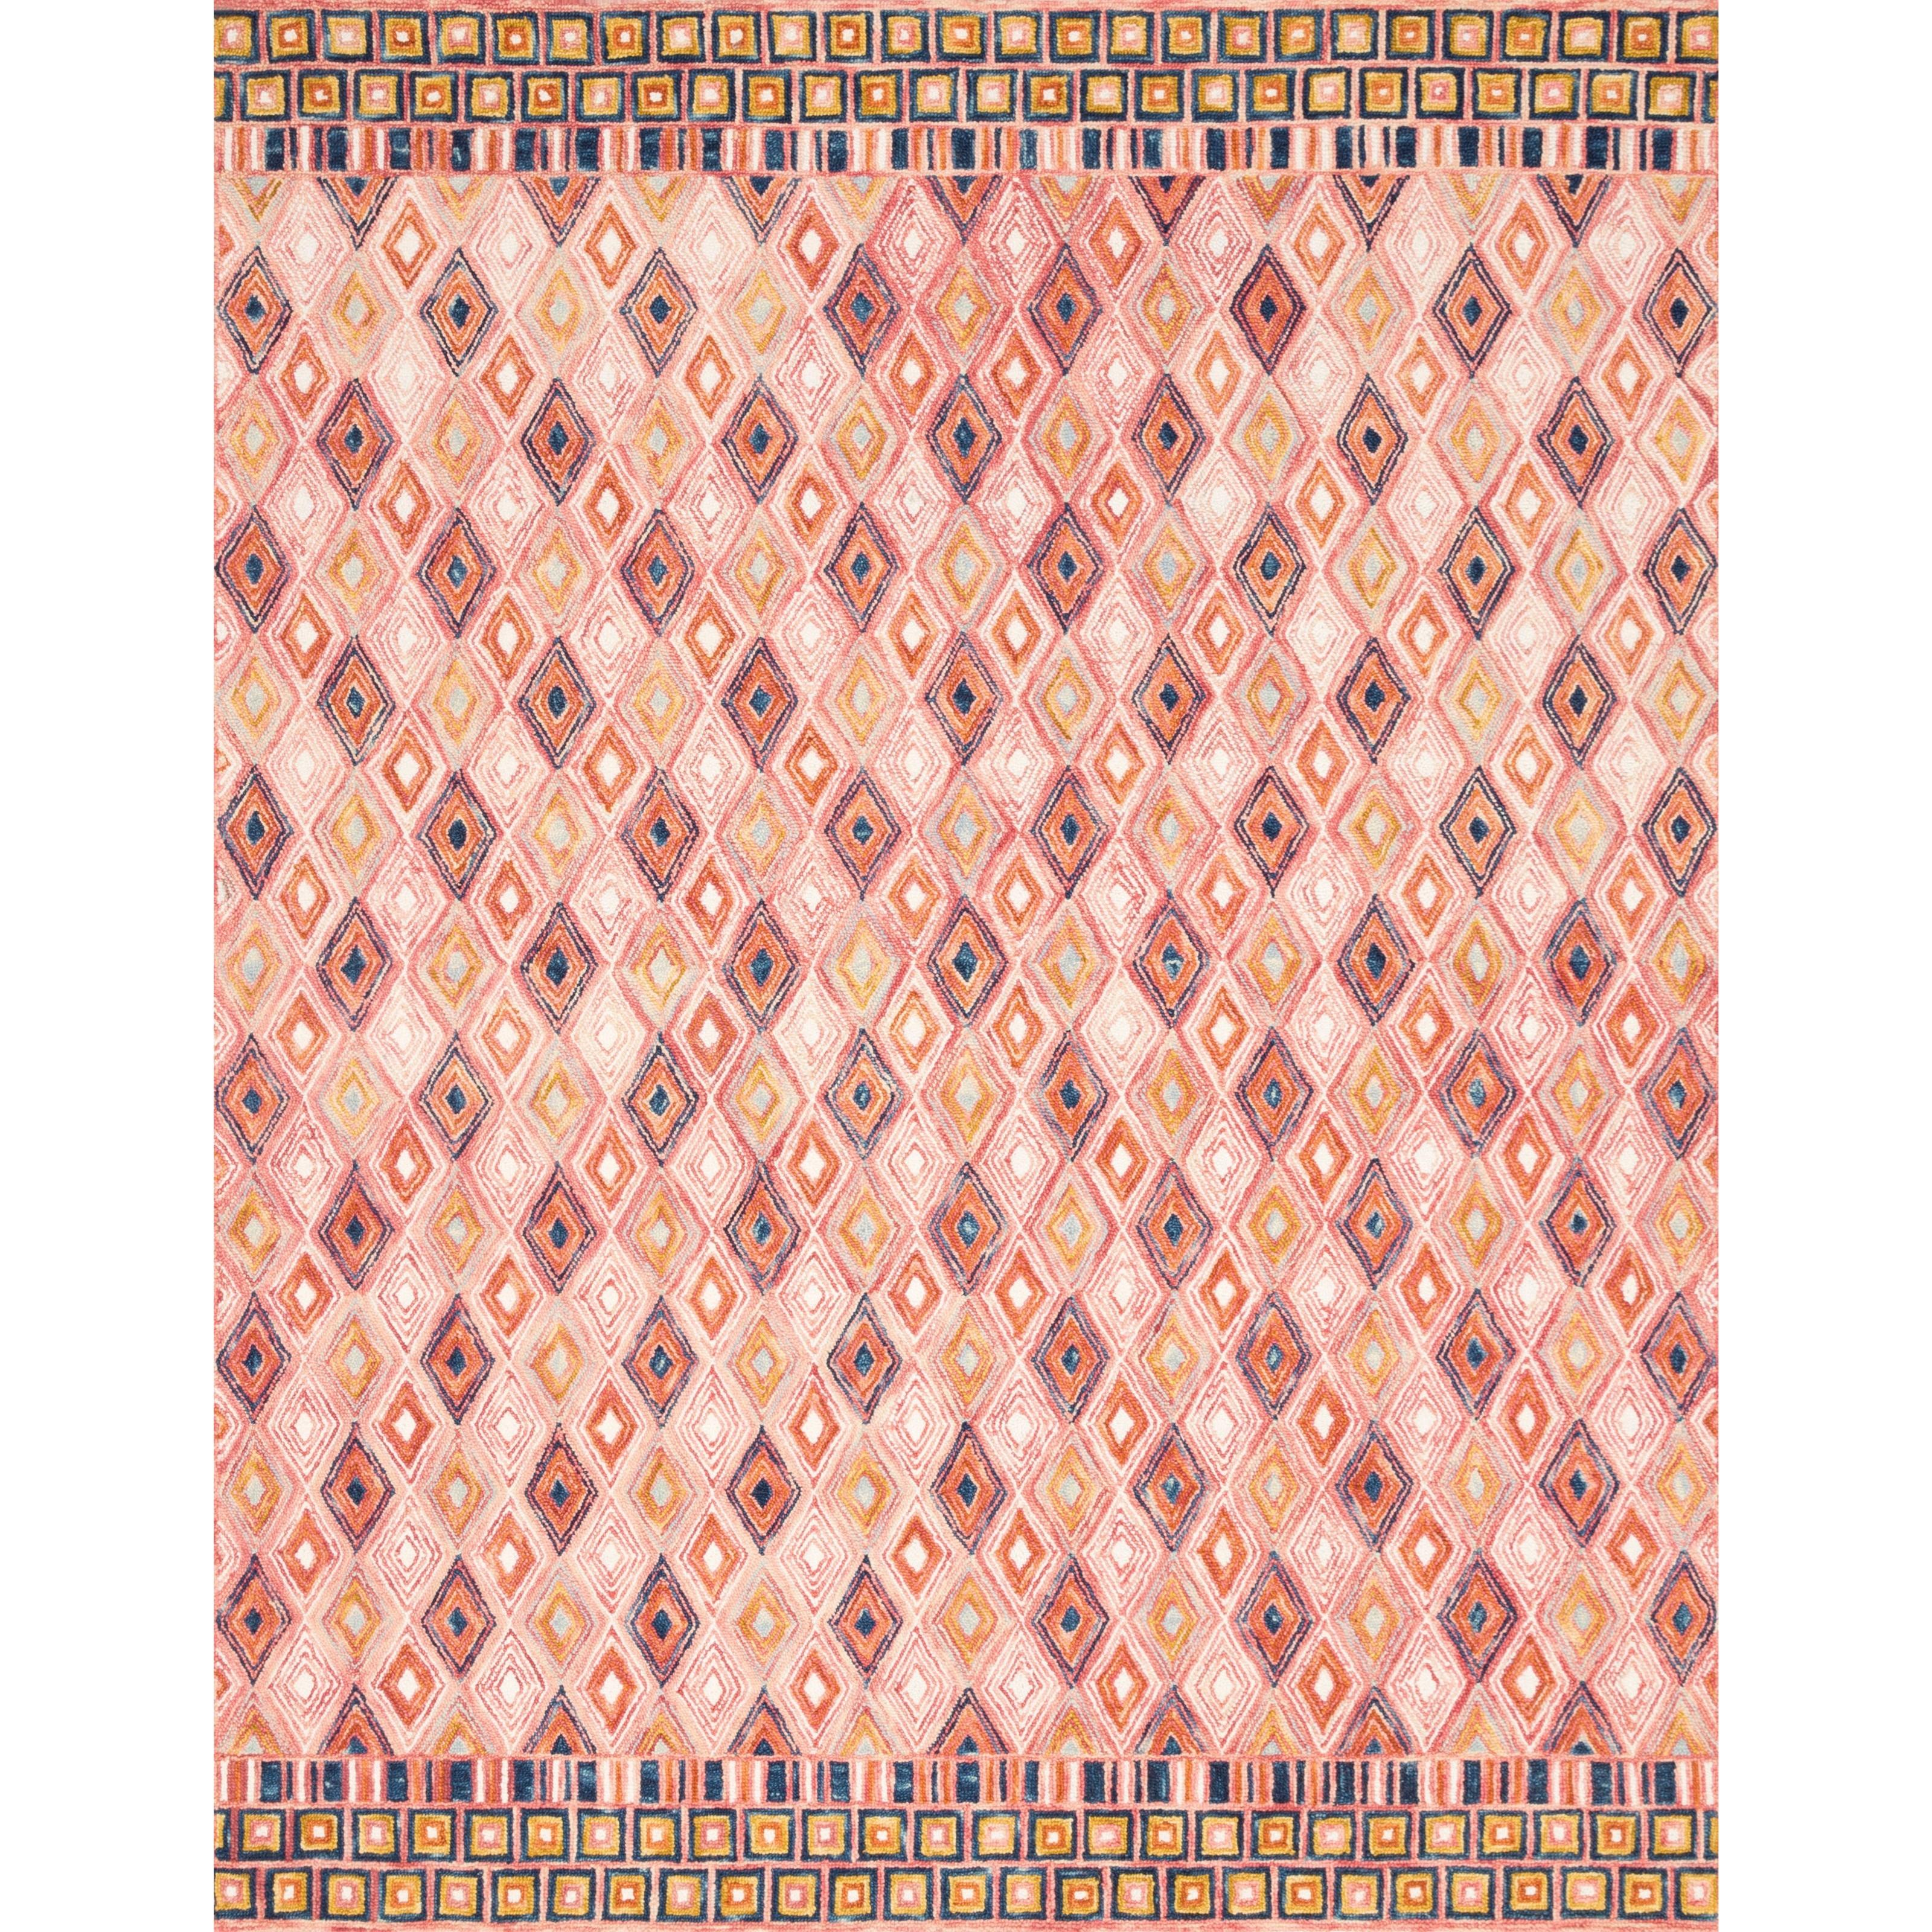 "Priti 3'6"" x 5'6"" Pink / Sunset Rug by Loloi Rugs at Virginia Furniture Market"